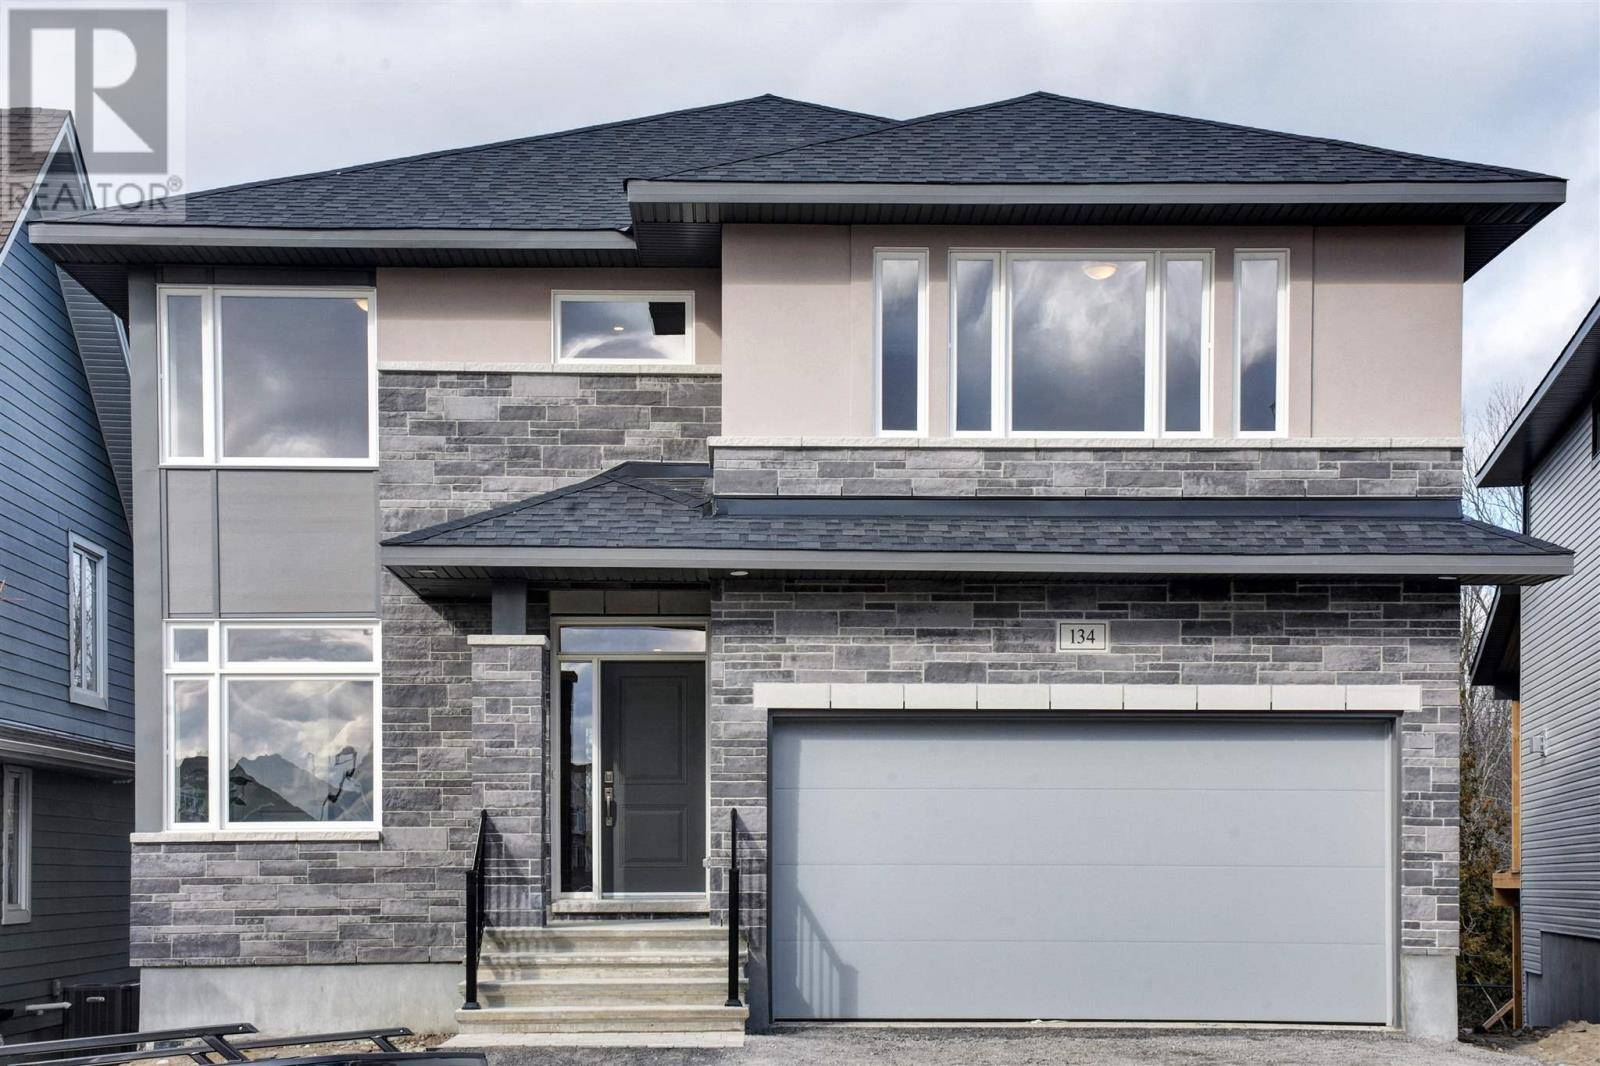 House for sale at 134 Escarpment Cres Kanata Ontario - MLS: K19007096